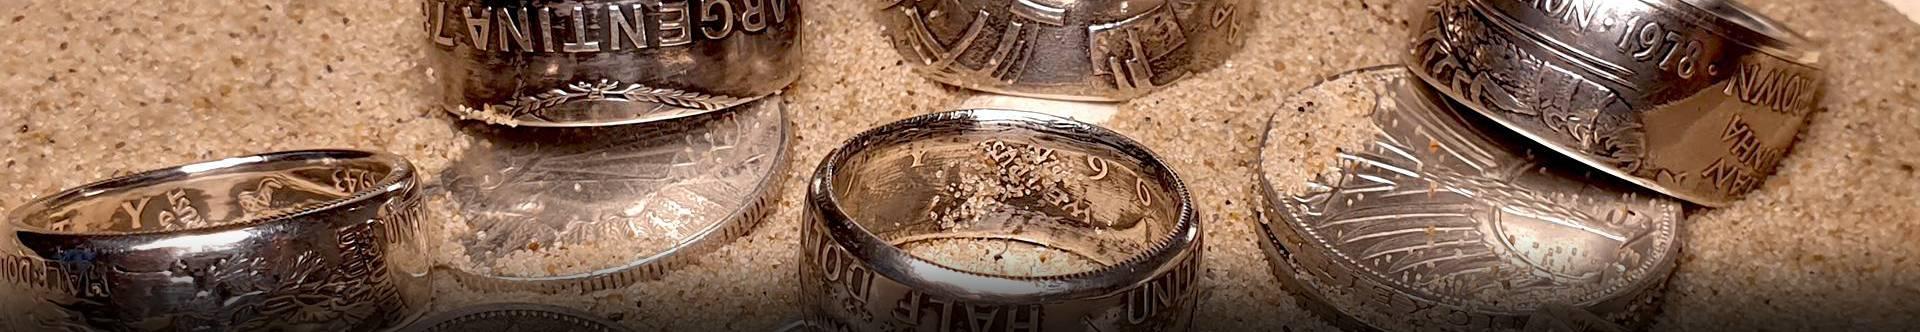 pierścienie z monet - banner